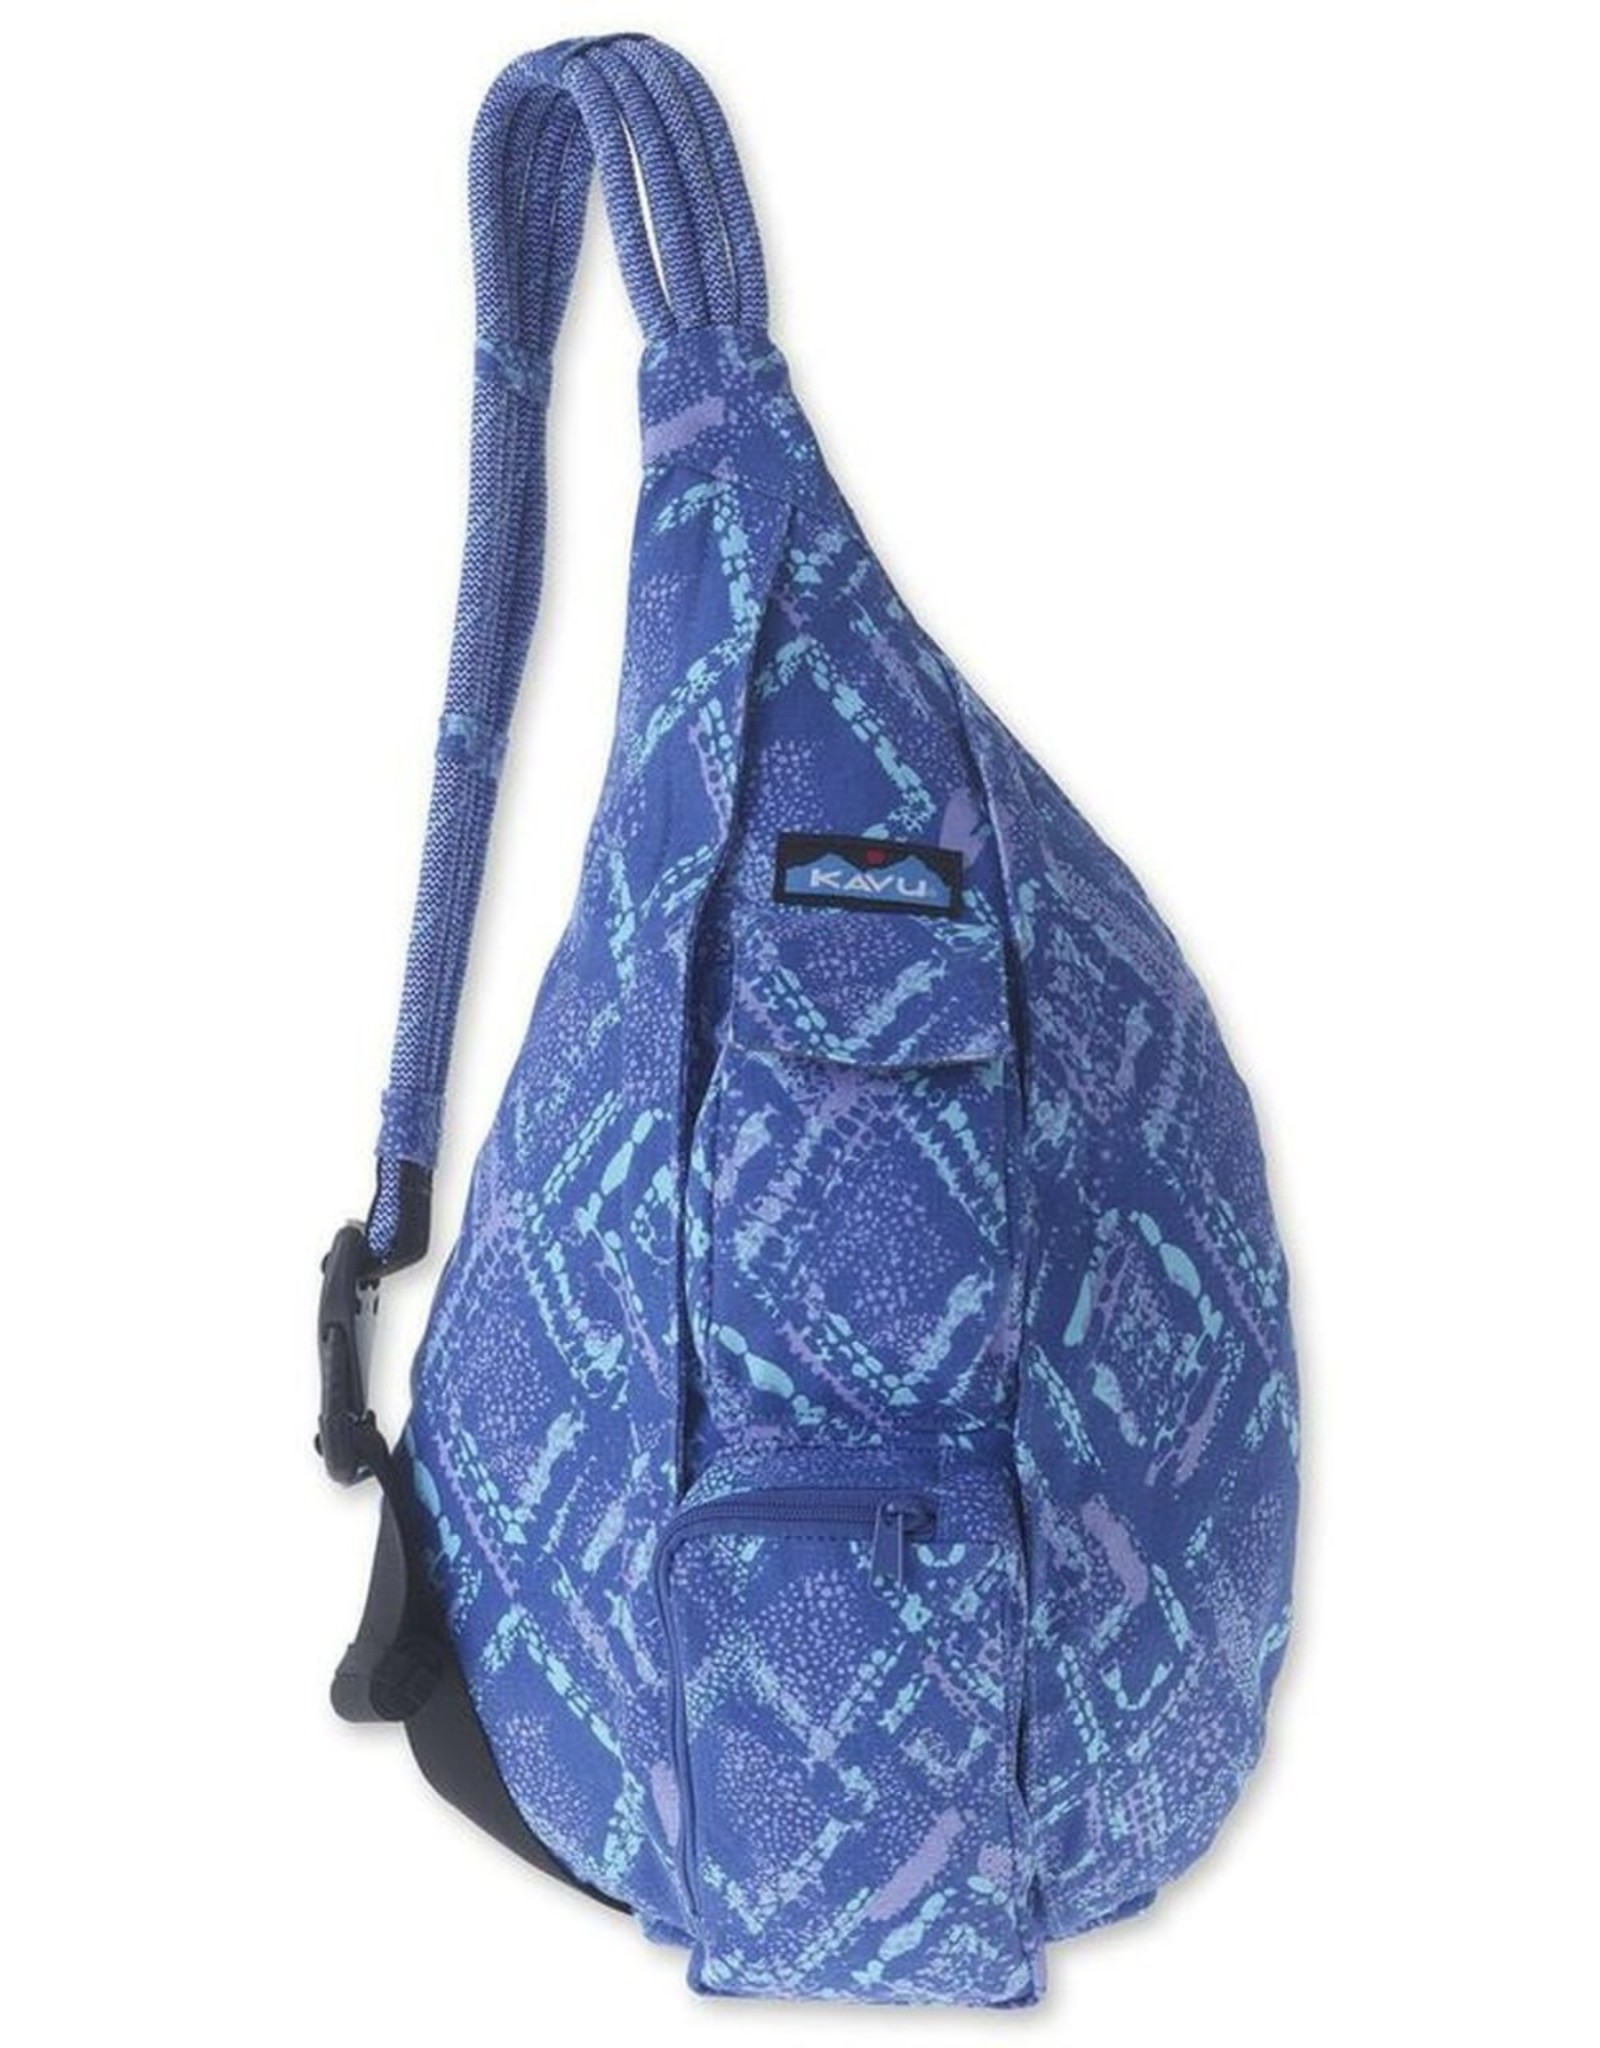 KAVU Rope Bag Ocean Overlay